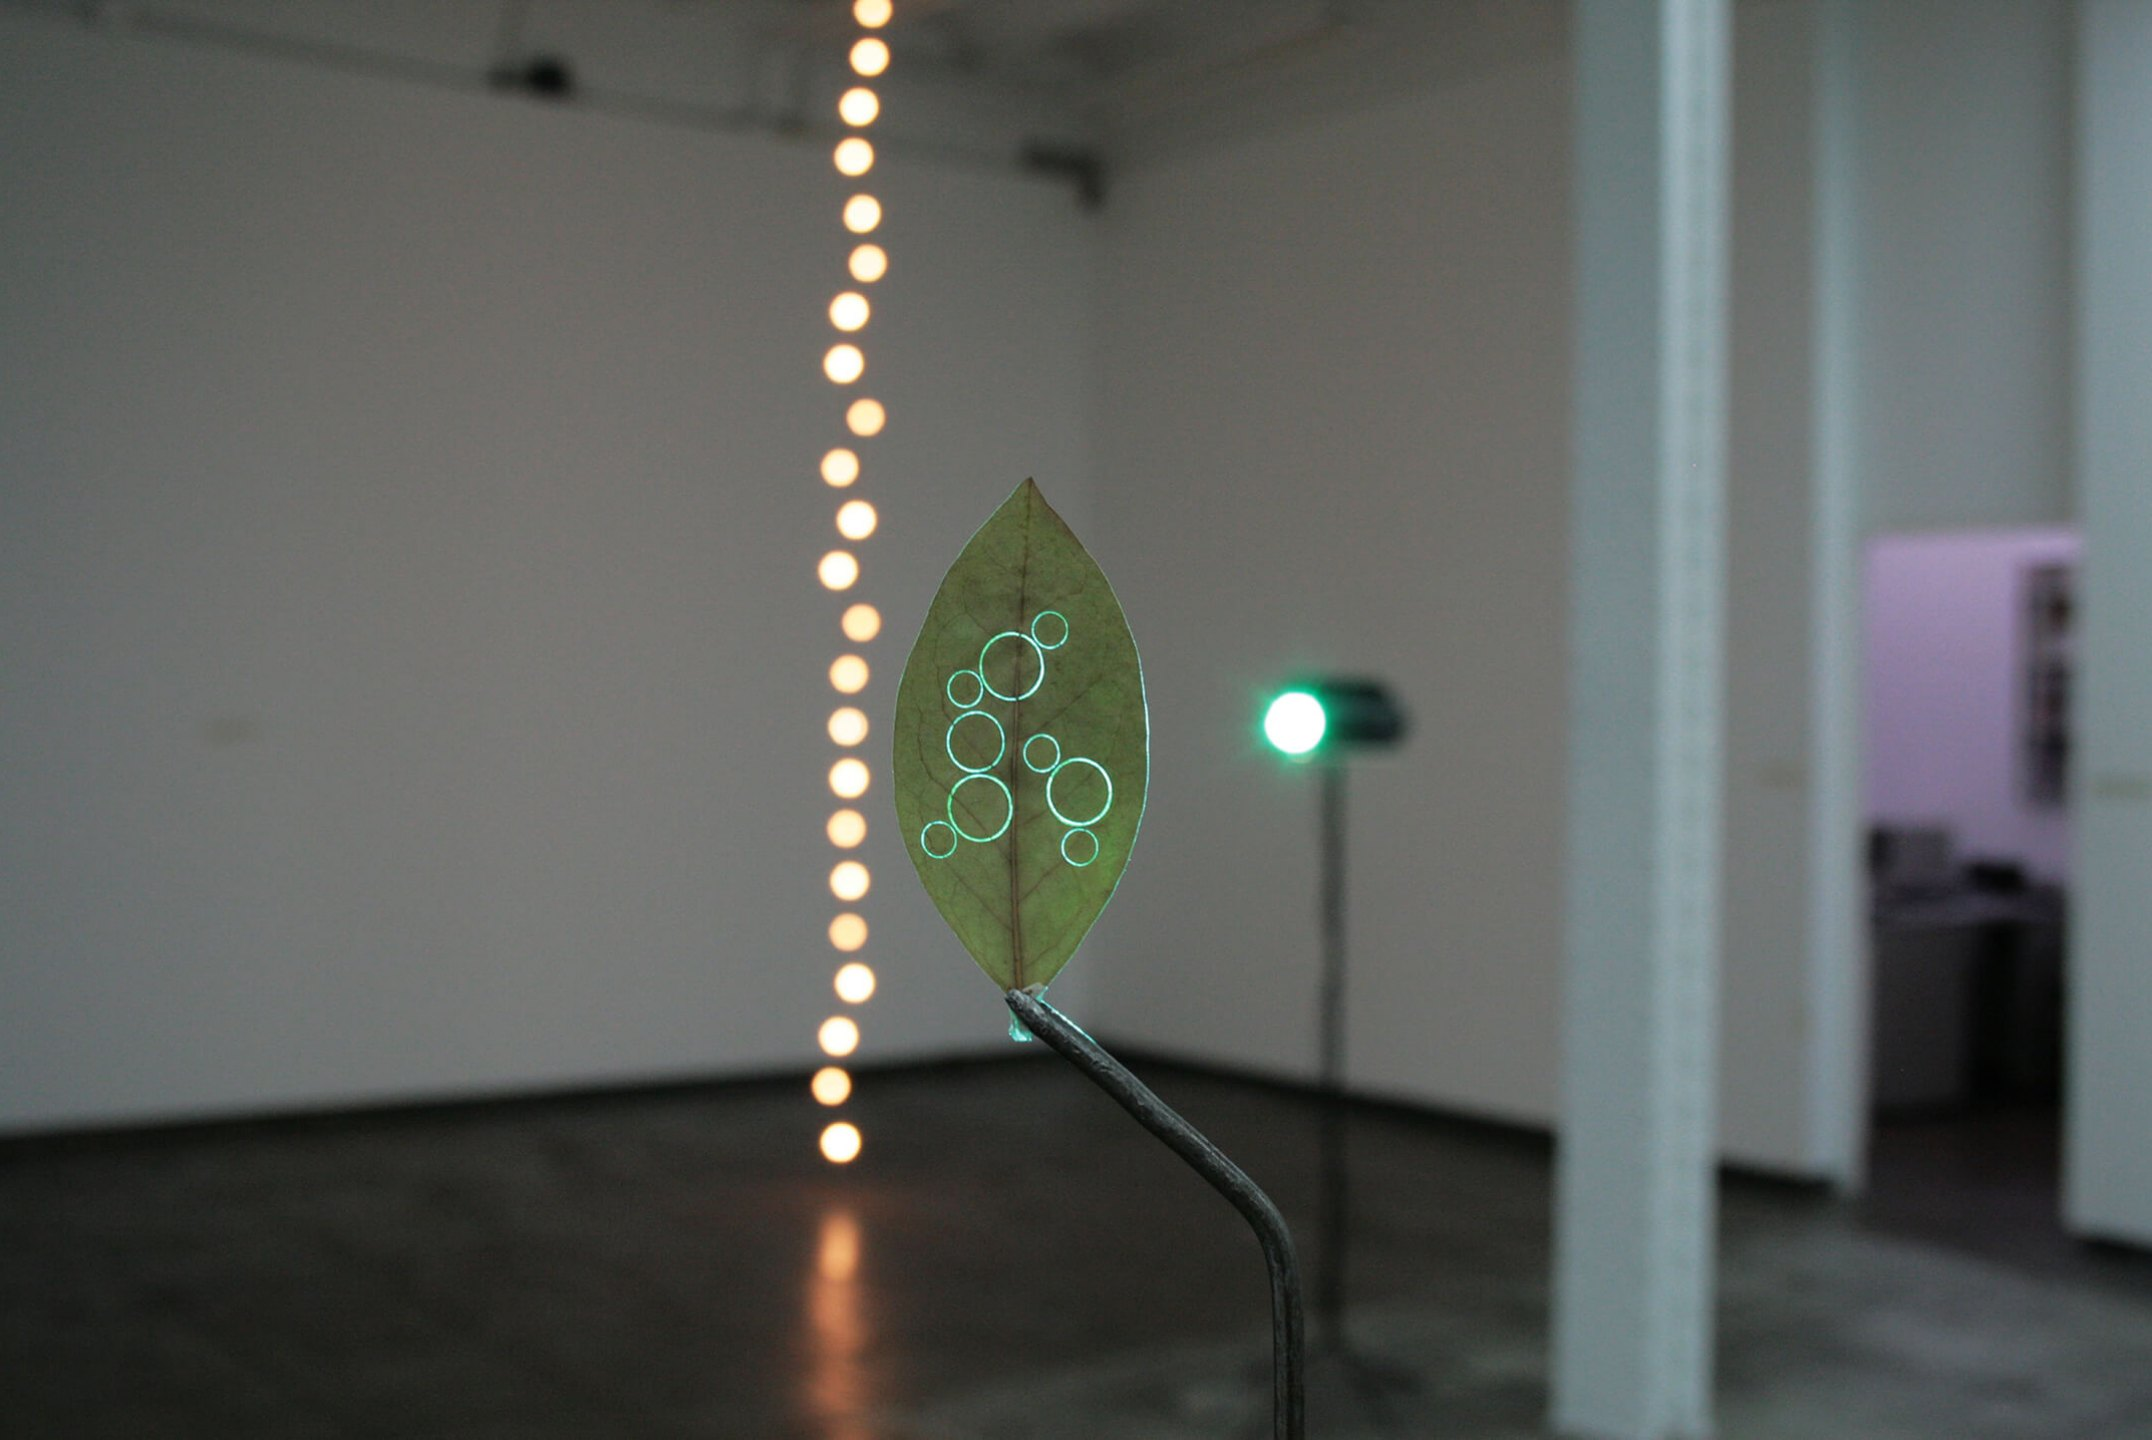 Daniel Steegmann Mangrané,<em>Elegancia y Renuncia</em>, 2011, mixed media, variable dimensions - Mendes Wood DM